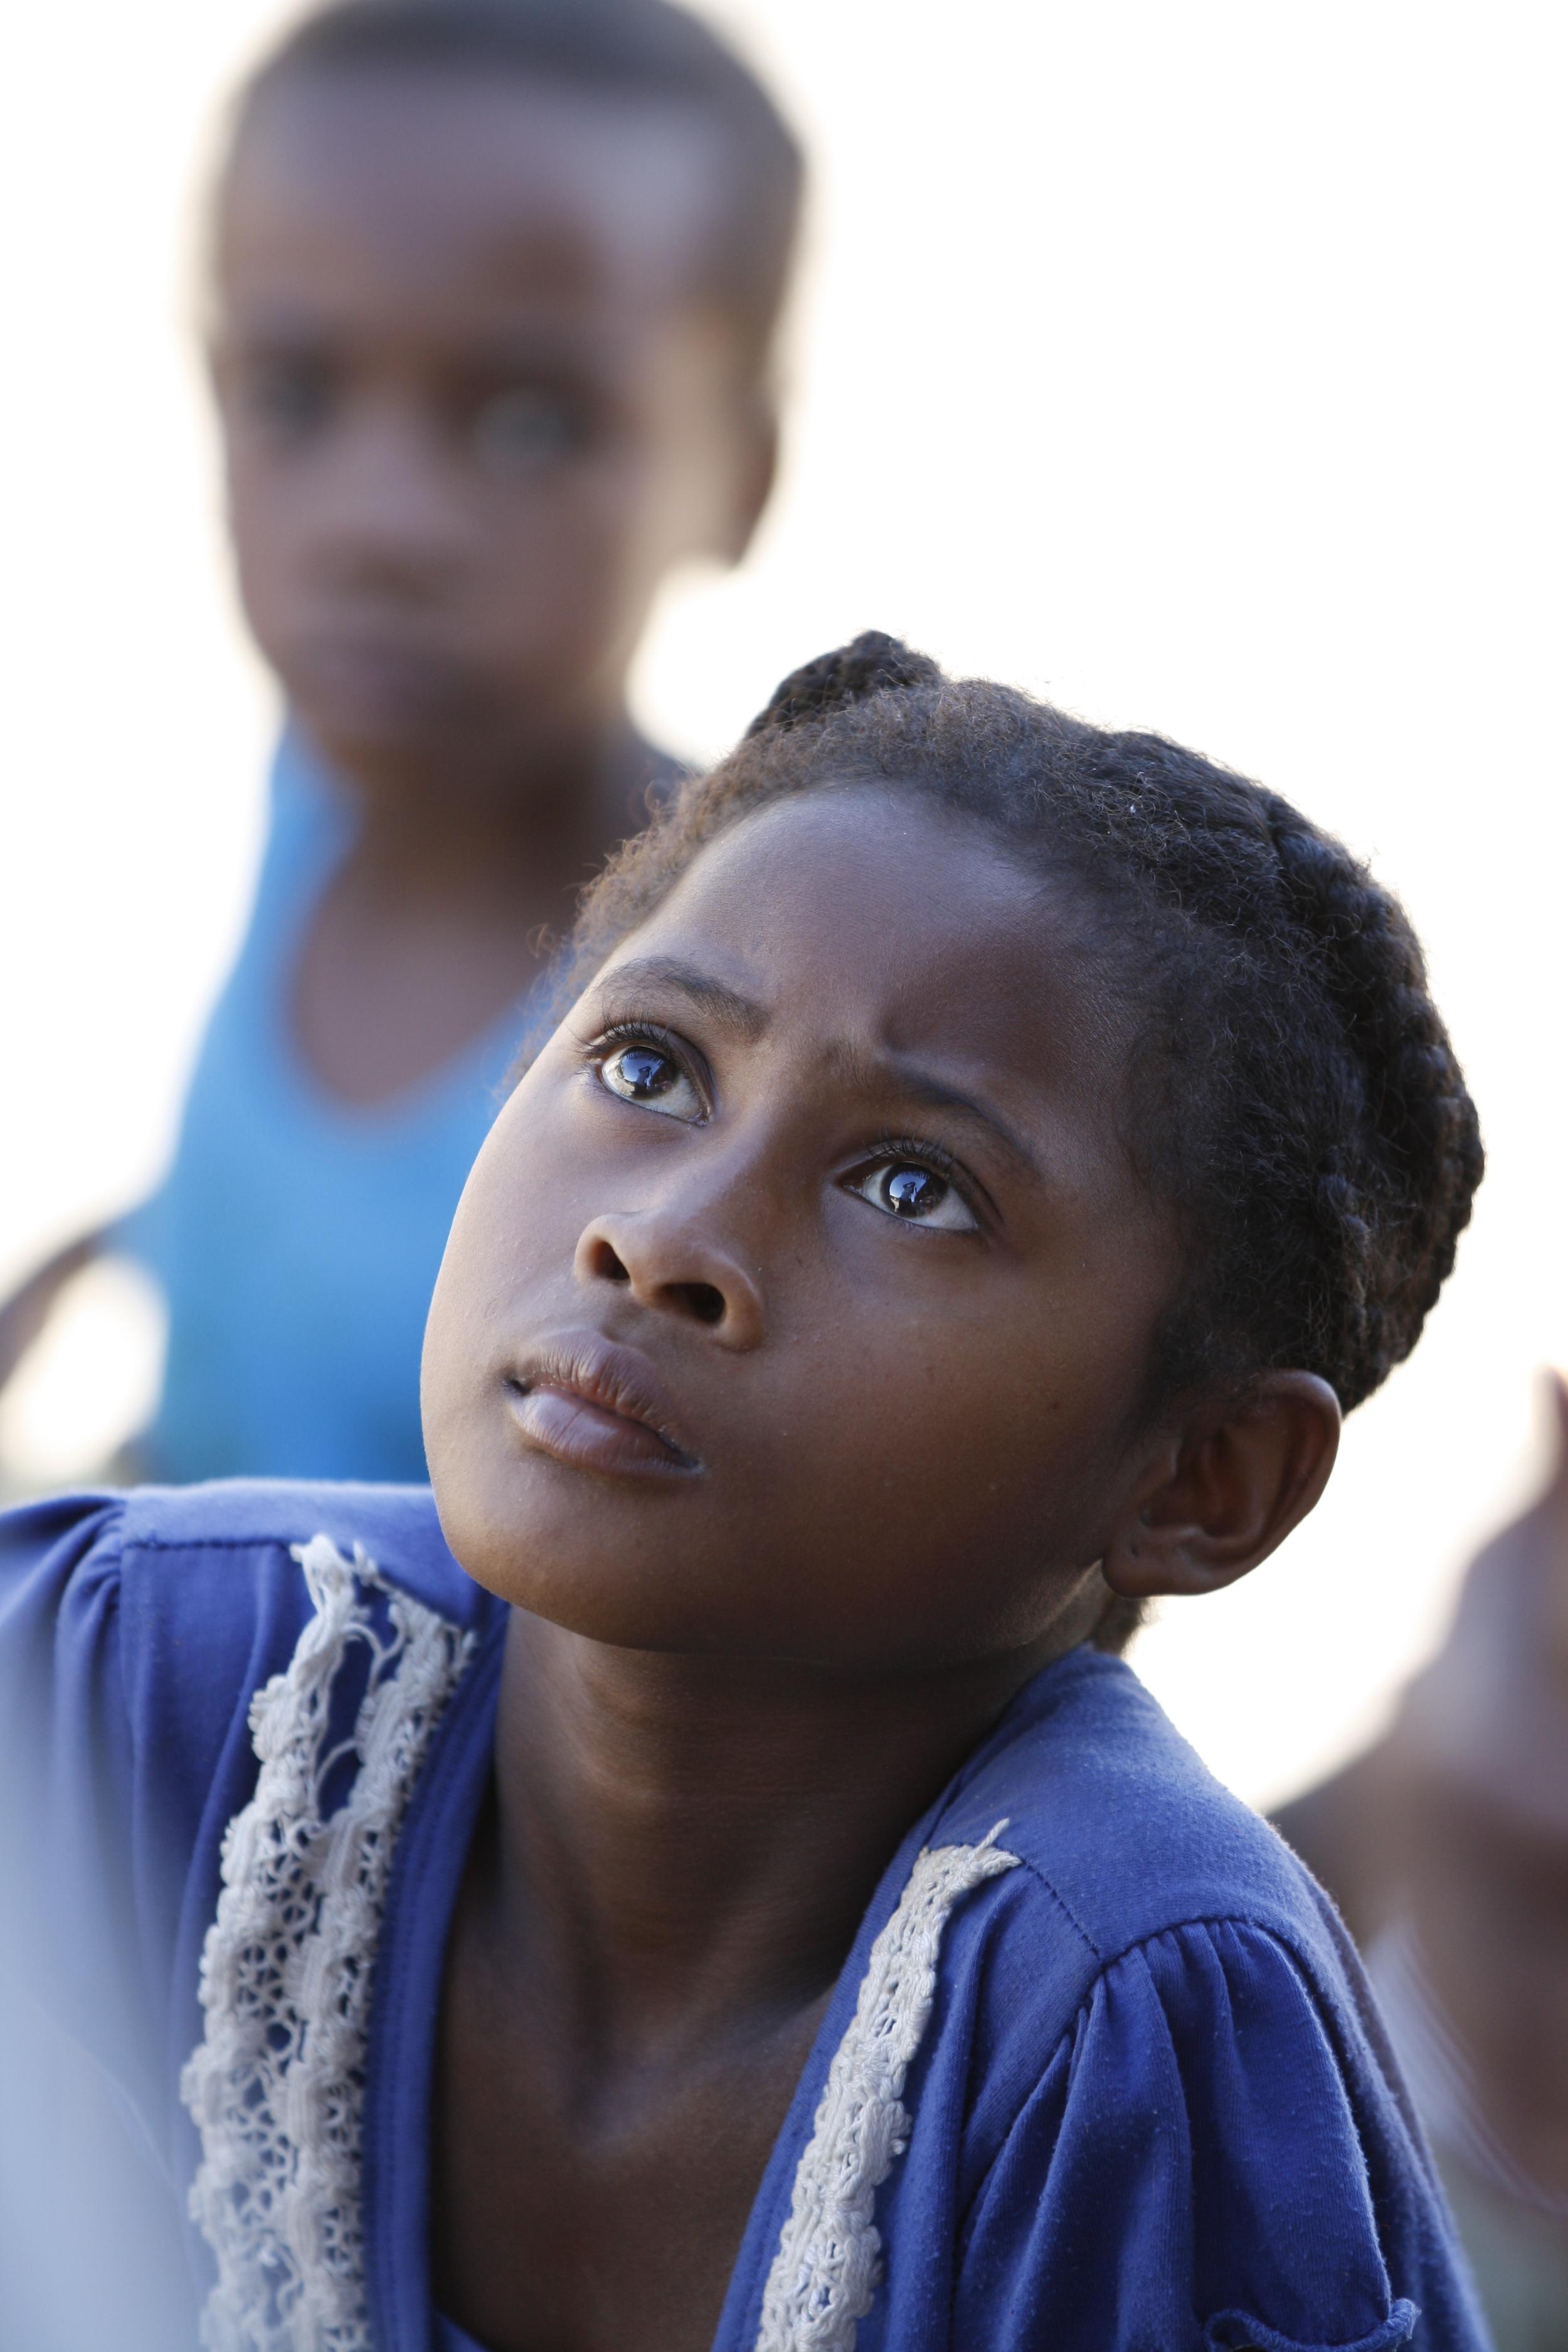 Young girl from Ambodivandrika (Vatomandry), Madagascar